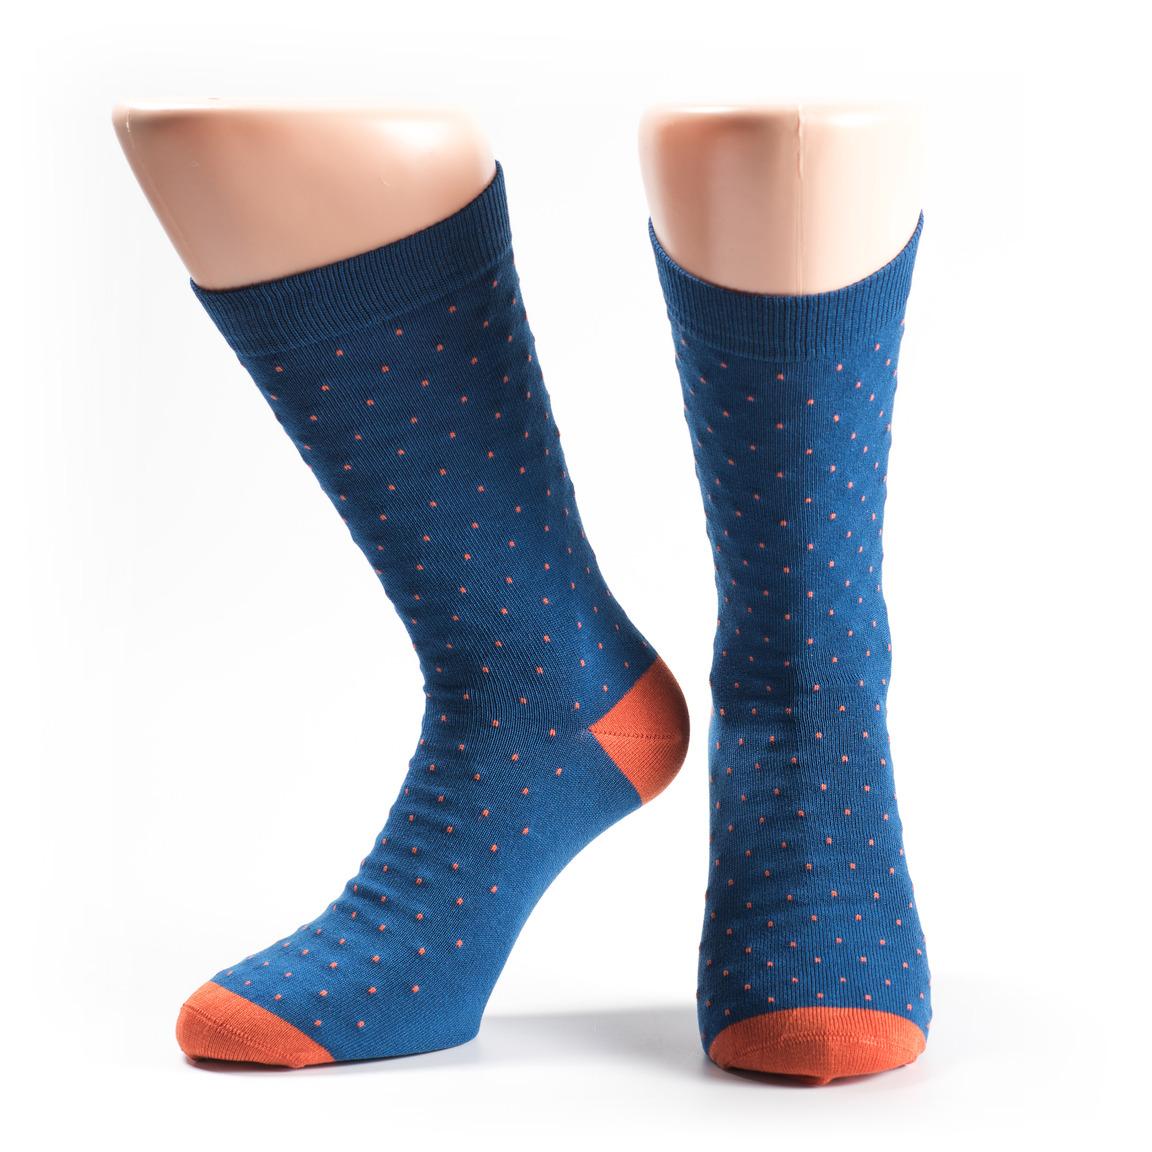 Men's blue socks with orange dots